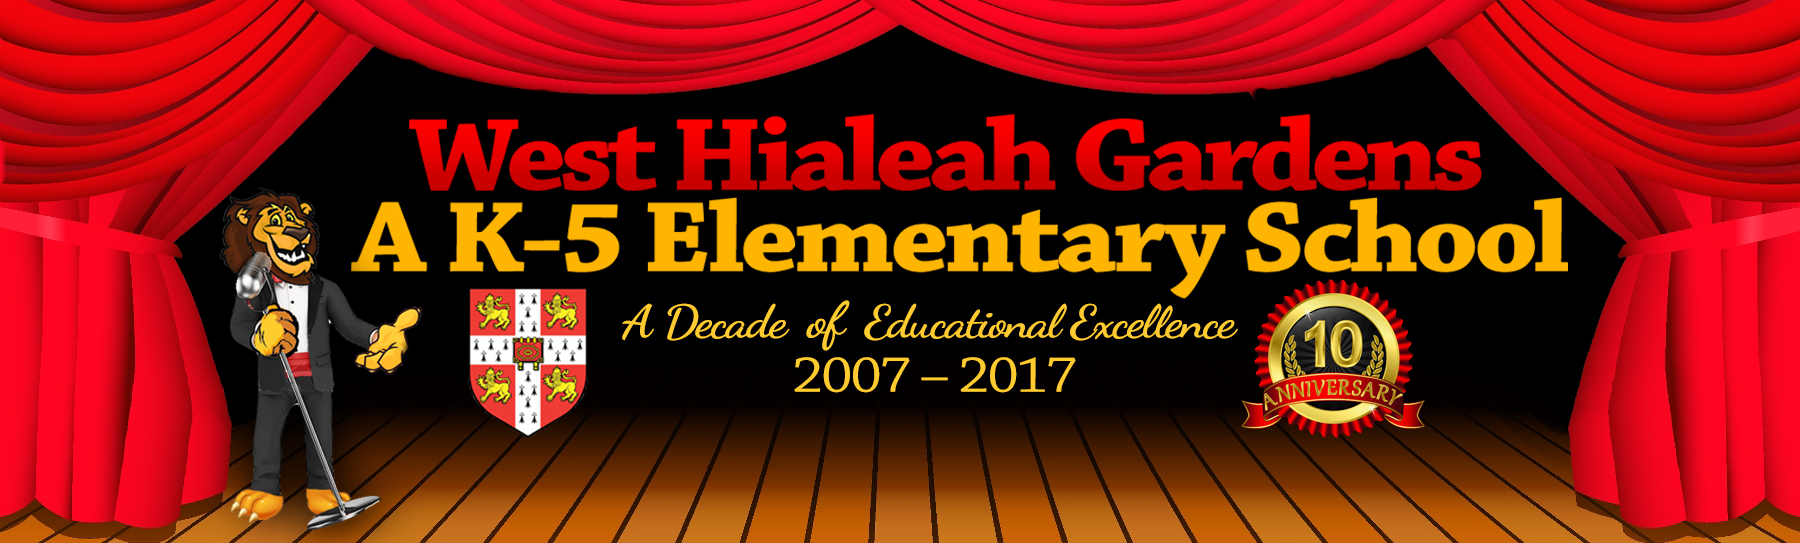 West Hialeah Gardens Elementary